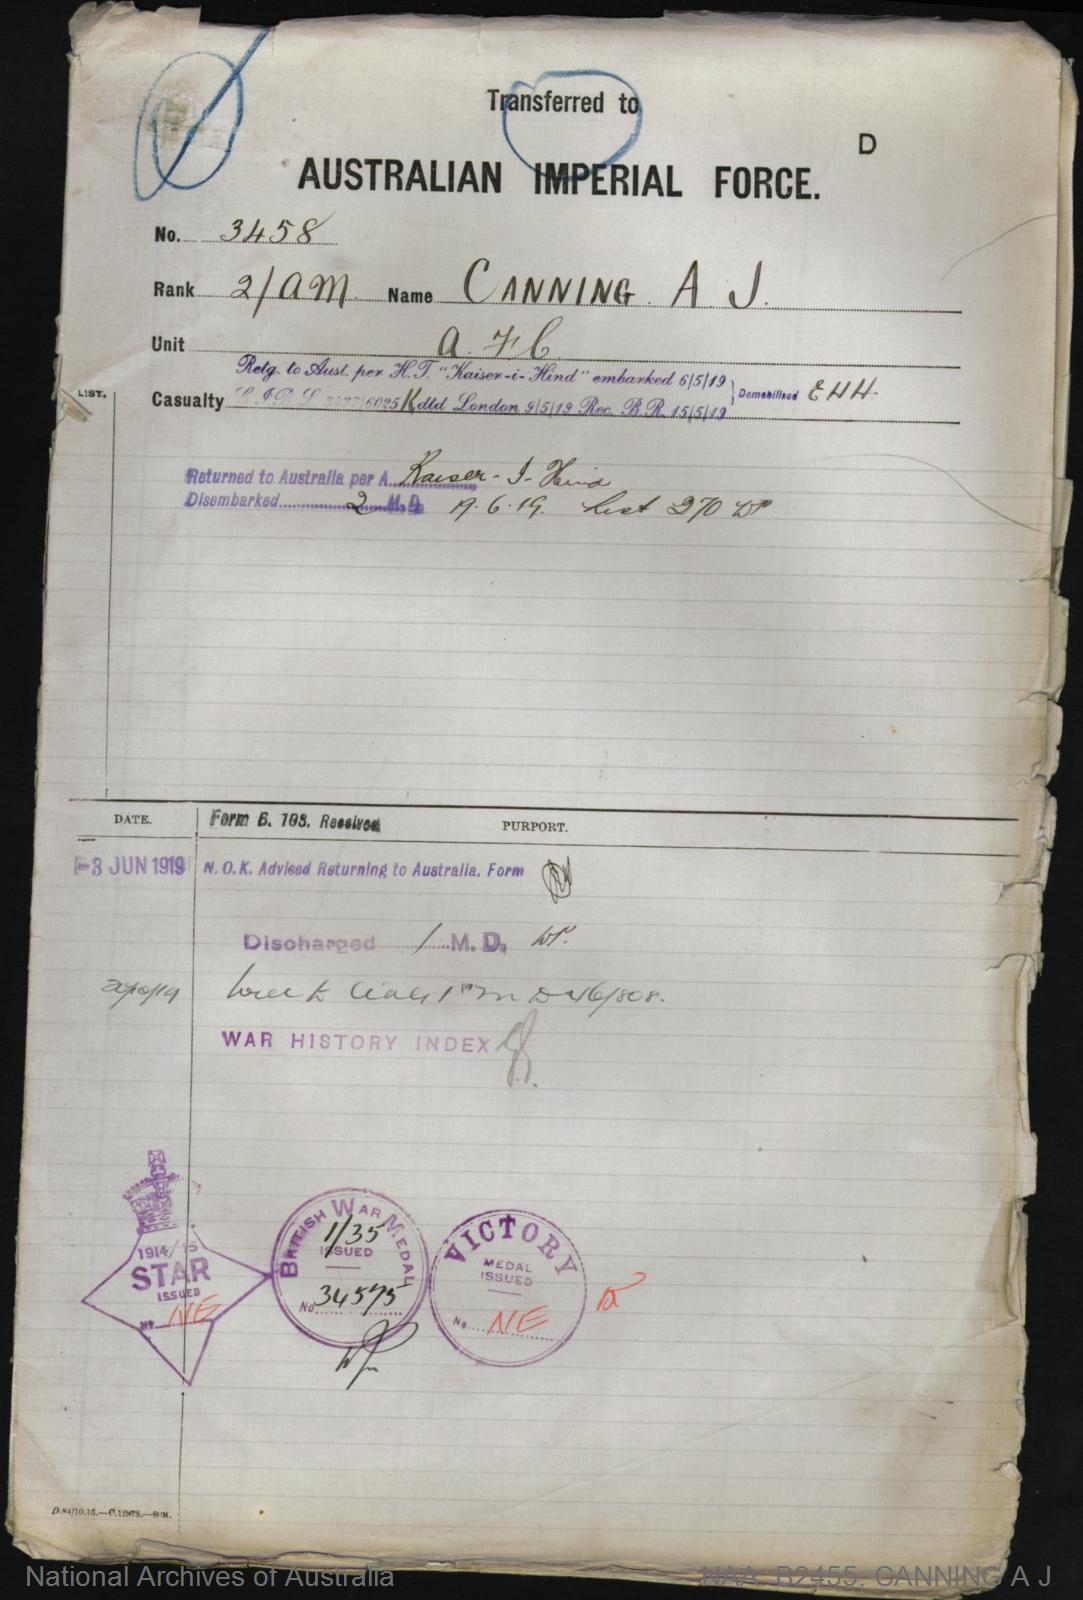 Canning Allan Johnstone : SERN 3458 : POB Paisley Scotland : POE Rockhampton QLD : NOK W Canning Mary Logan